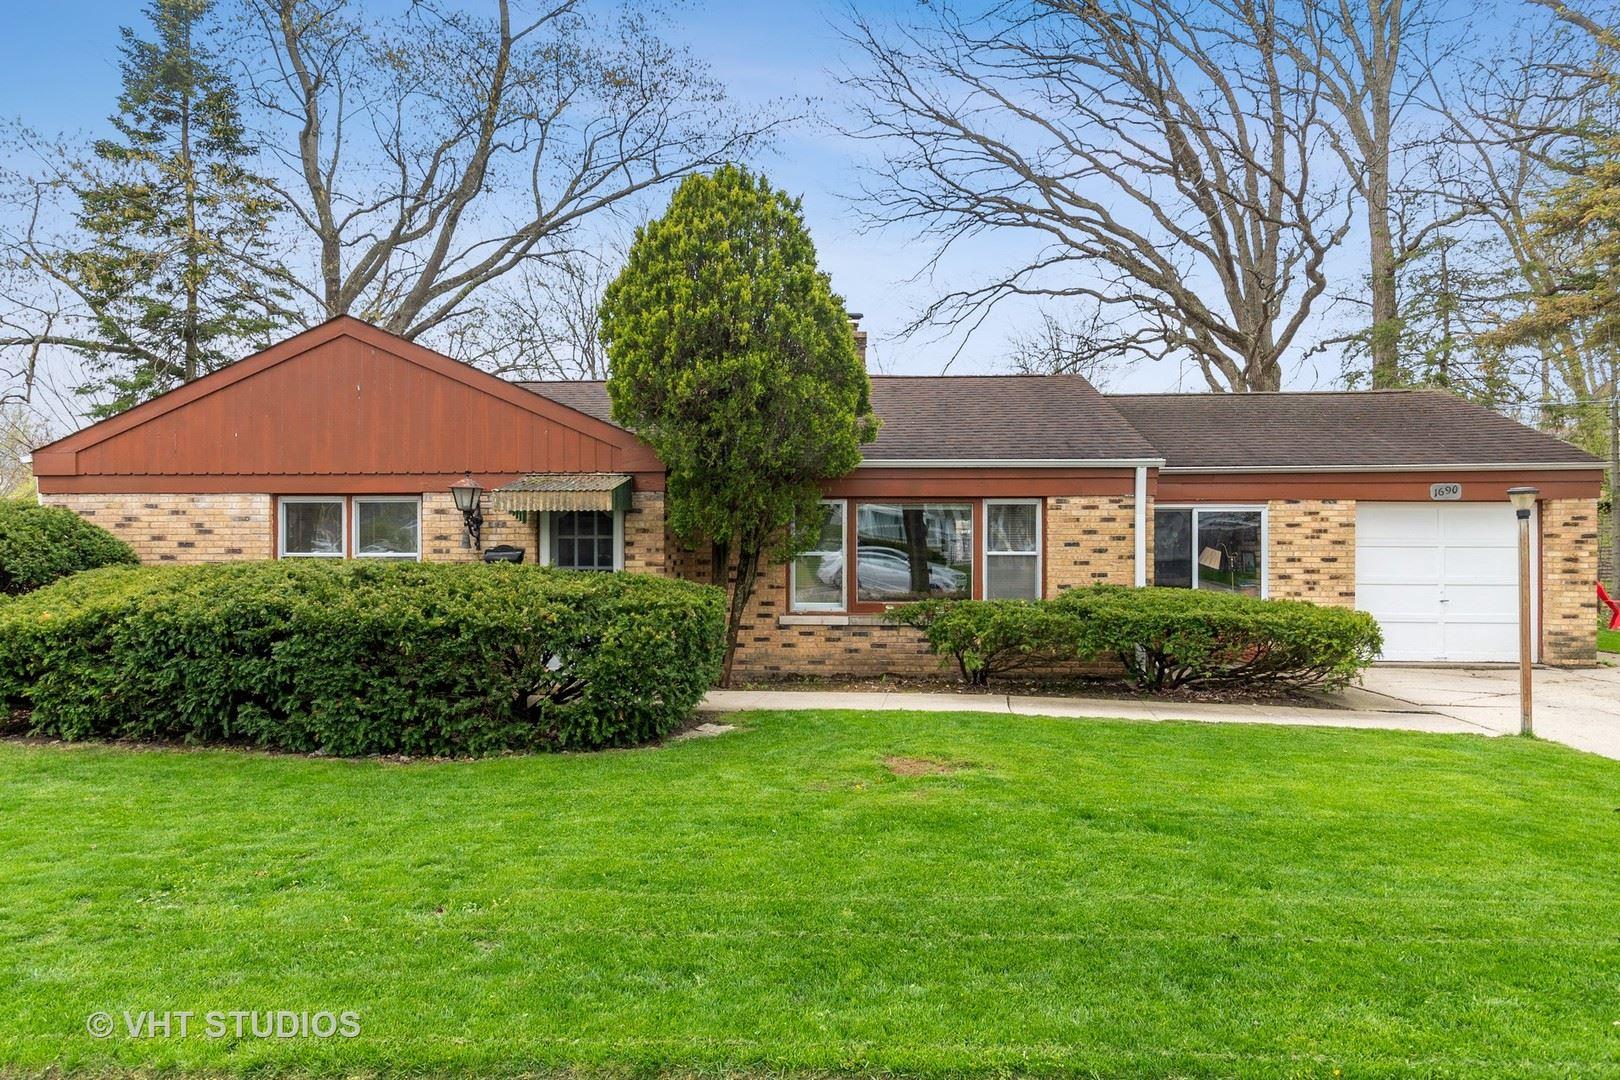 1690 Midland Avenue, Highland Park, IL 60035 - #: 11066183